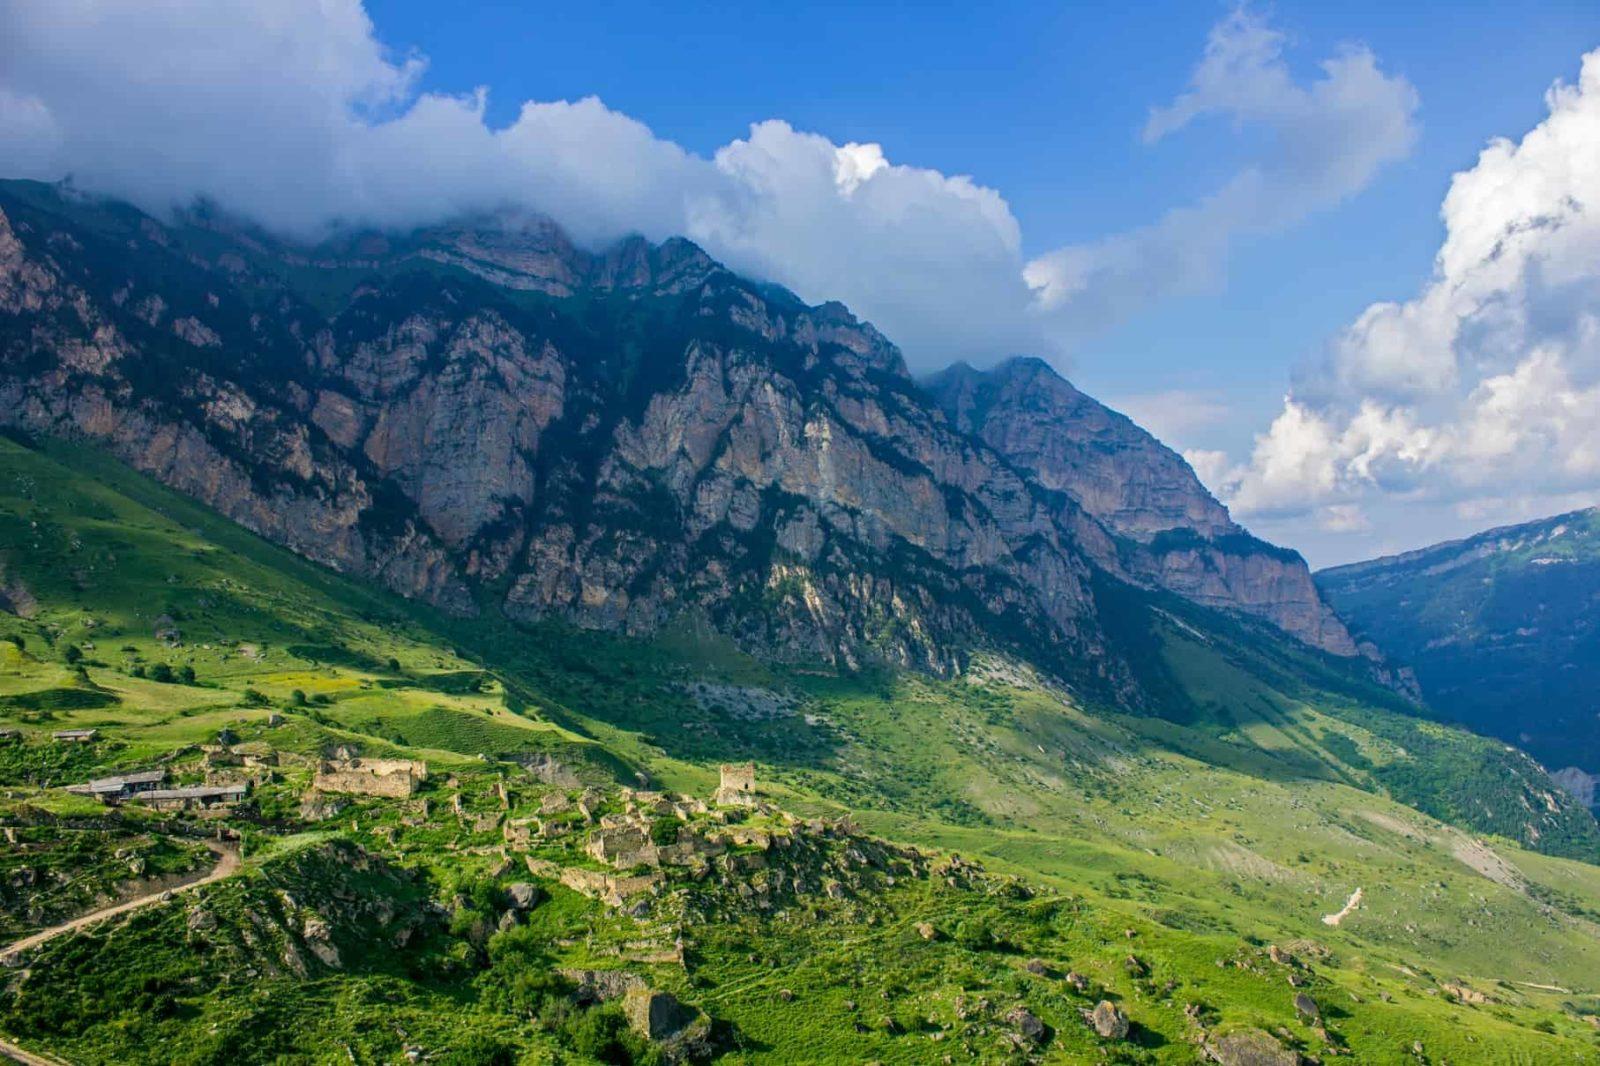 Tur Volshebnaja Digoria 2018 4 1535689363 - Загадки Дигории. Тур в Северную Осетию